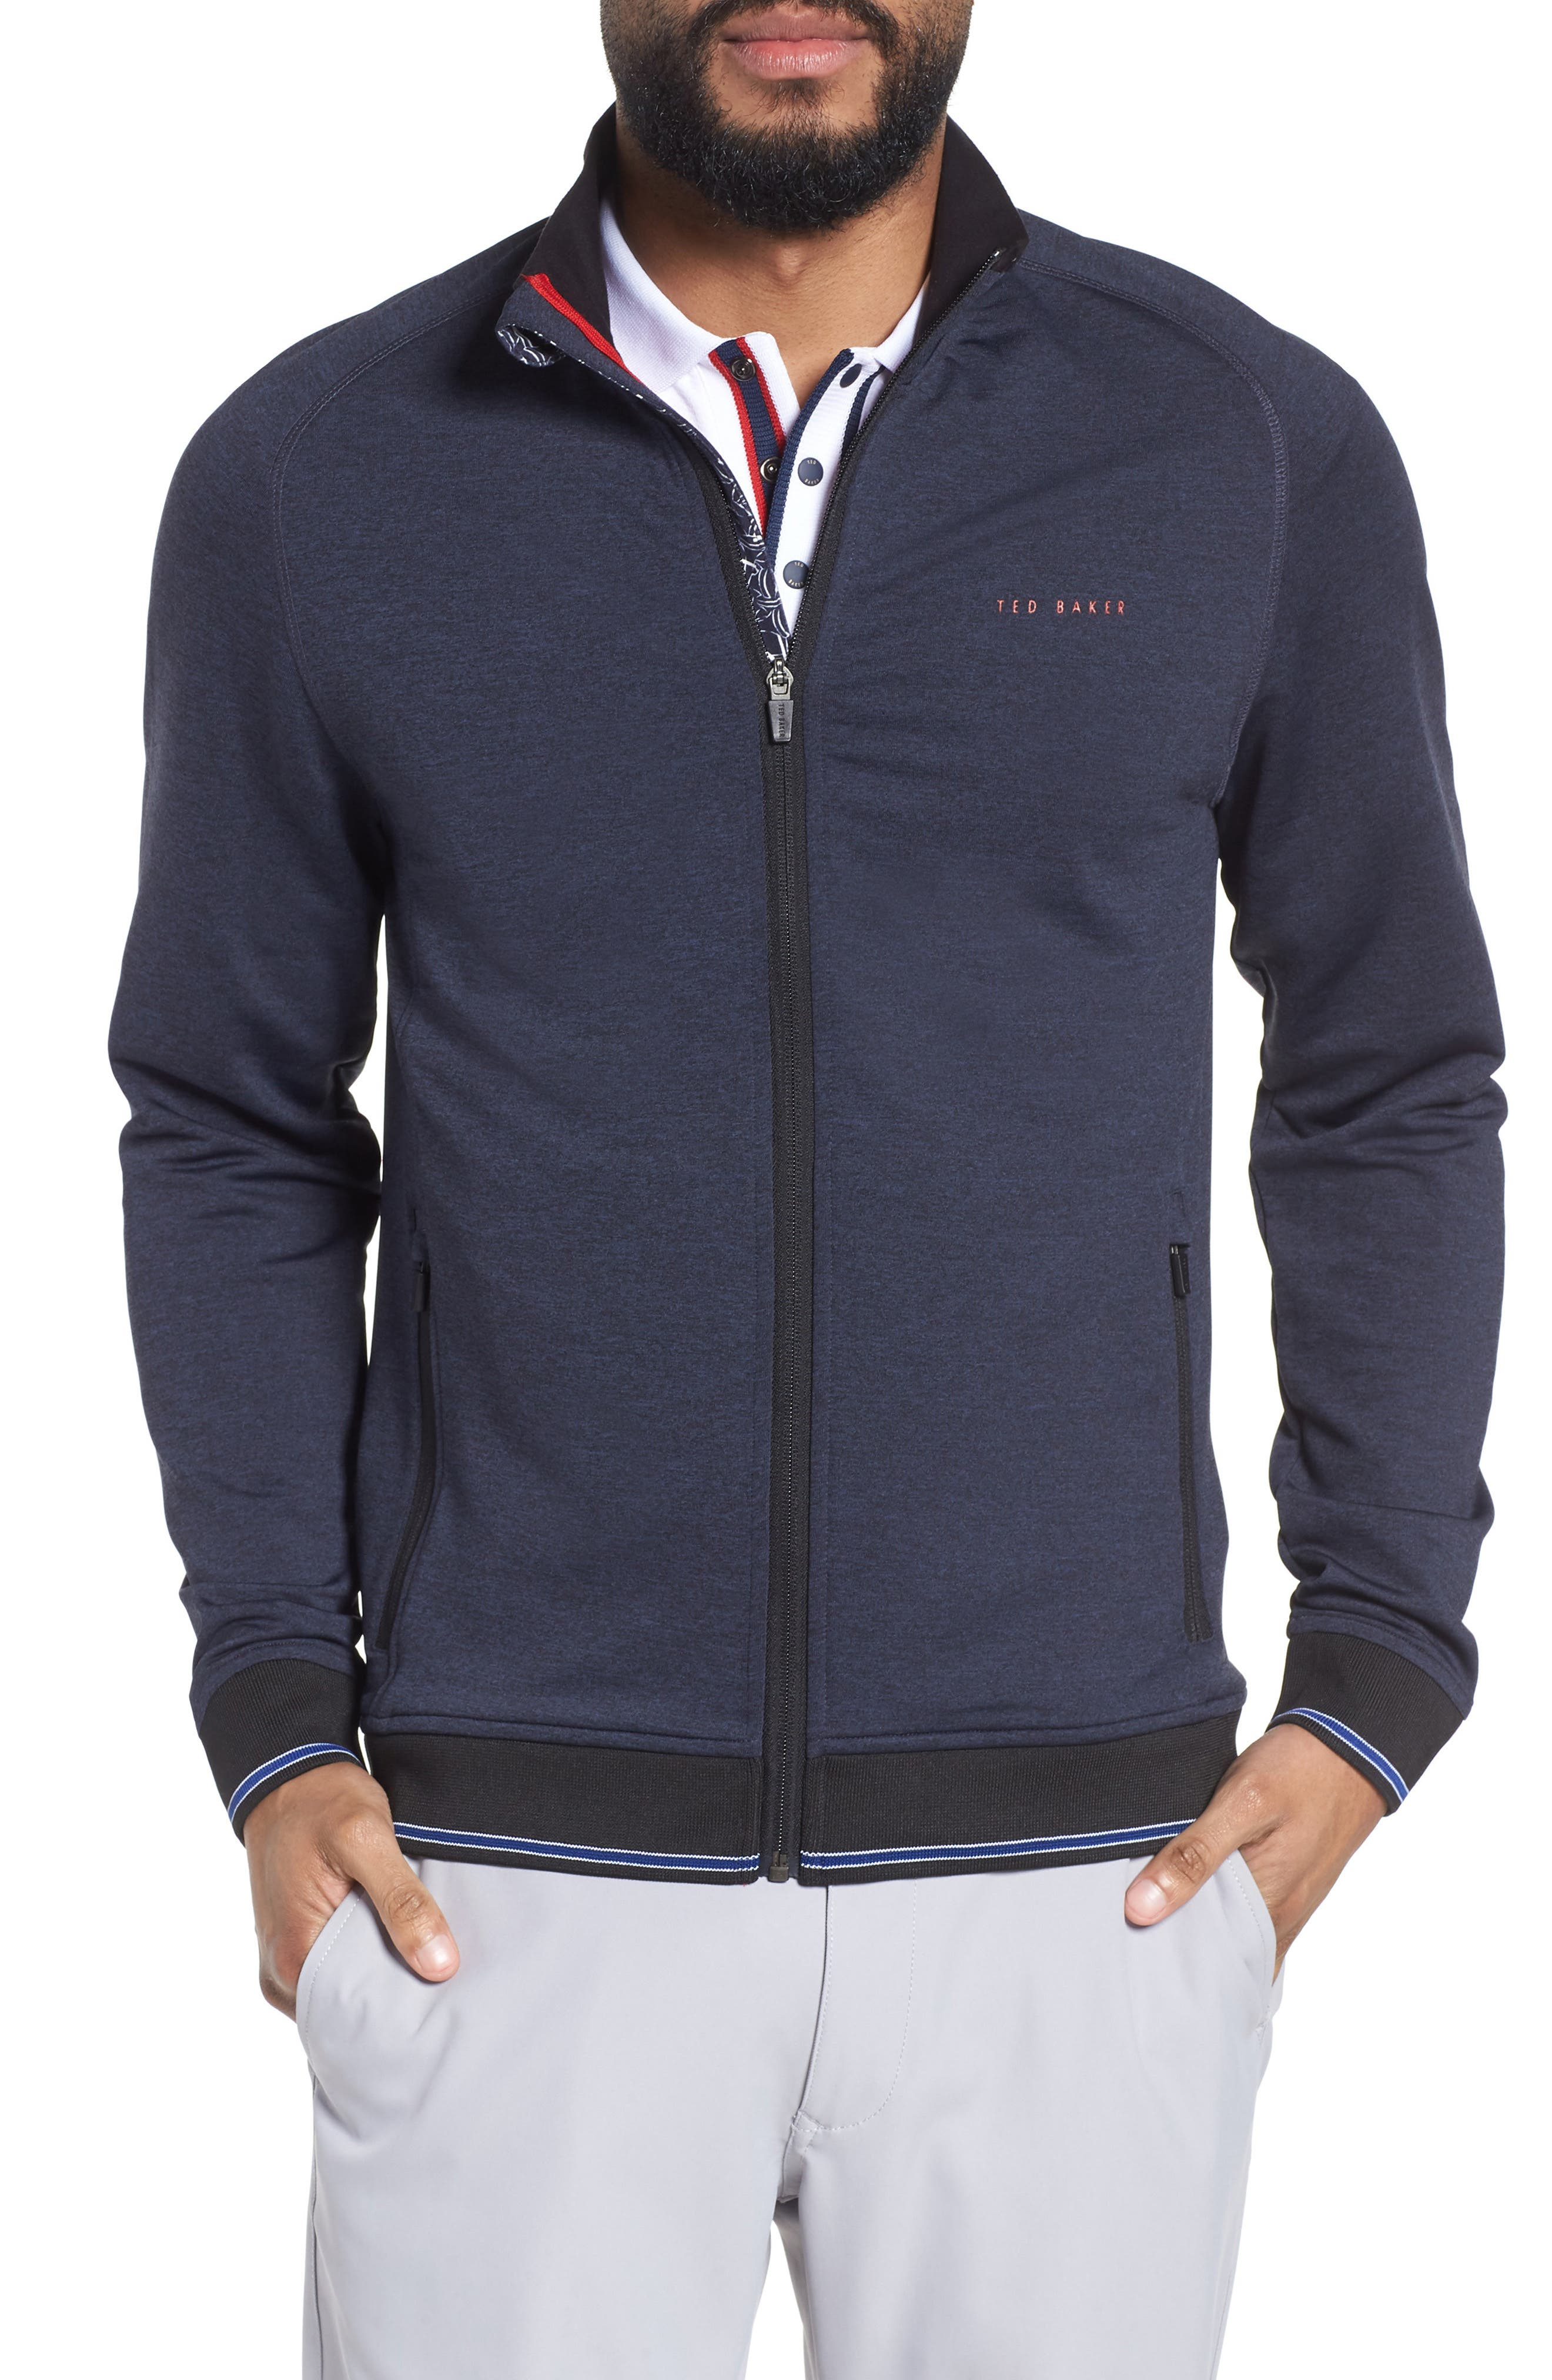 Alternate Image 1 Selected - Ted Baker London Parway Knit Golf Jacket